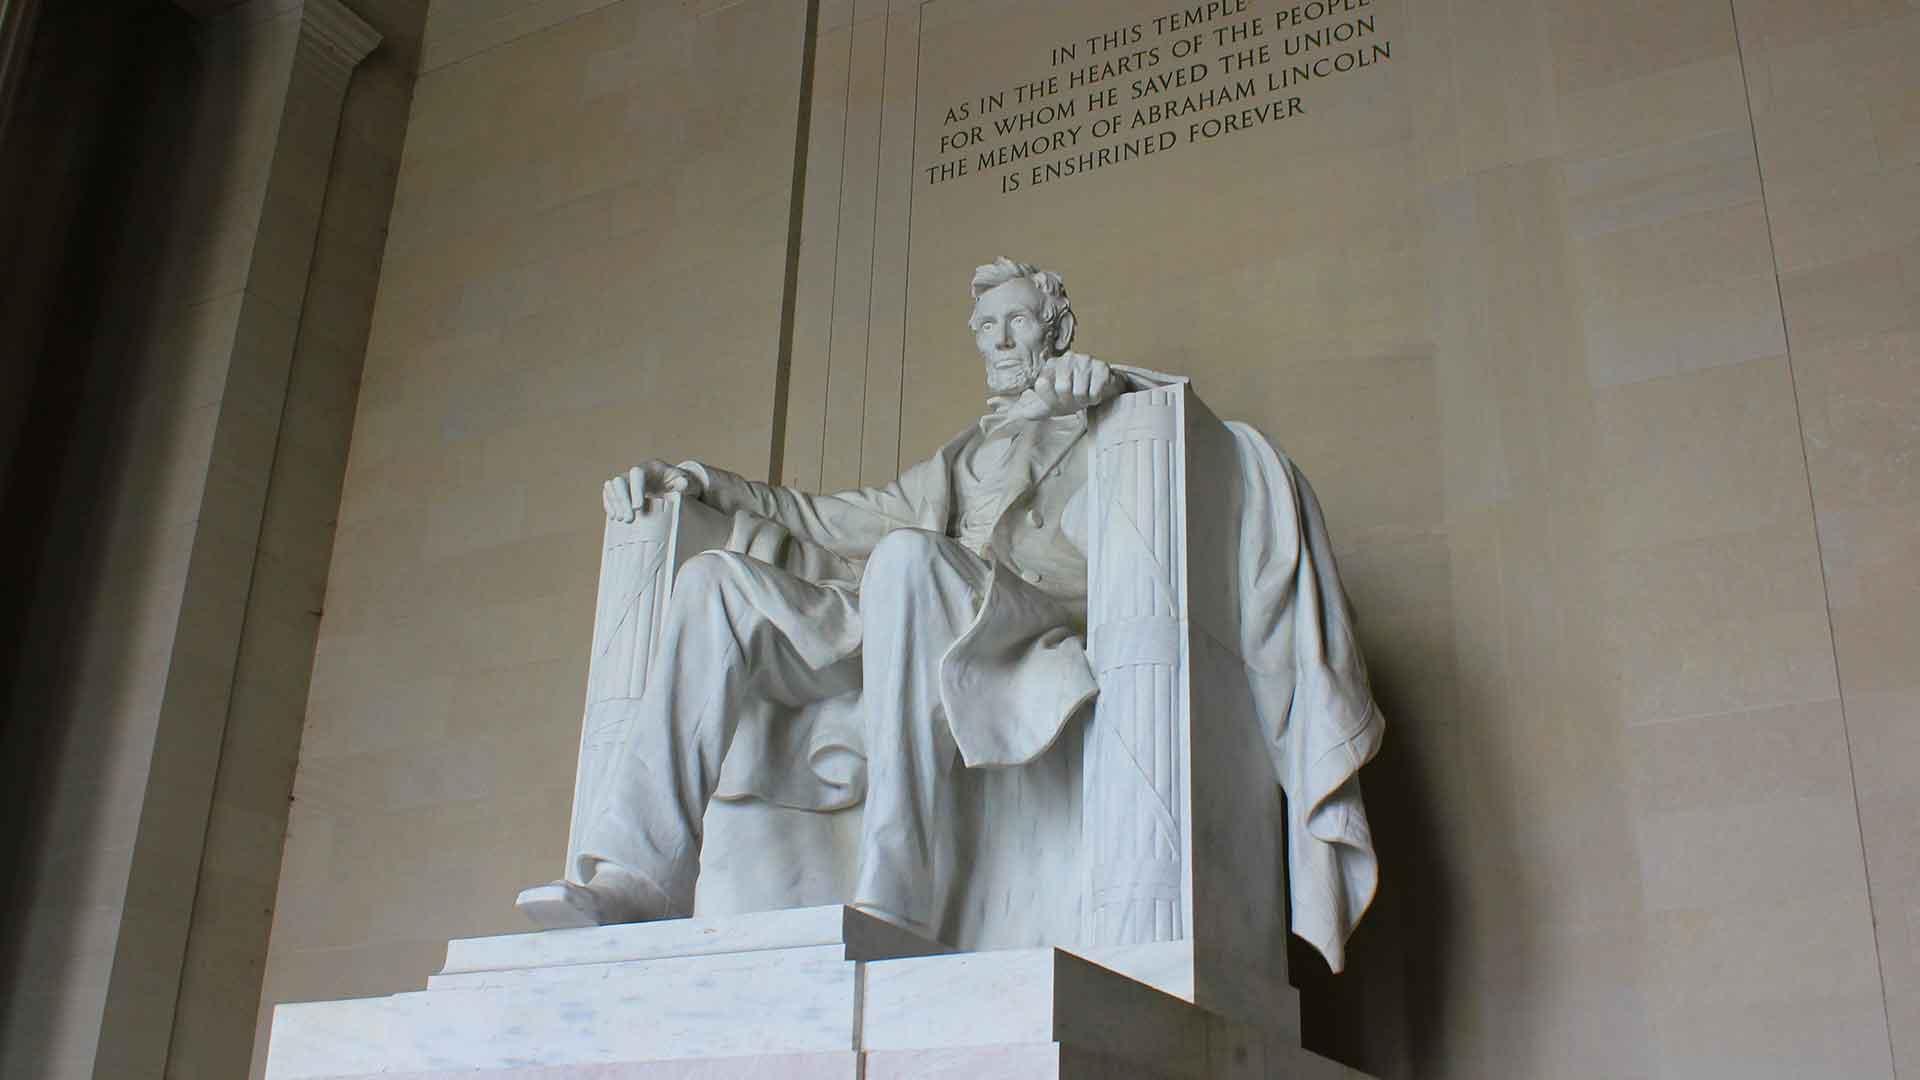 Abe-Lincoln-Memorial.jpg